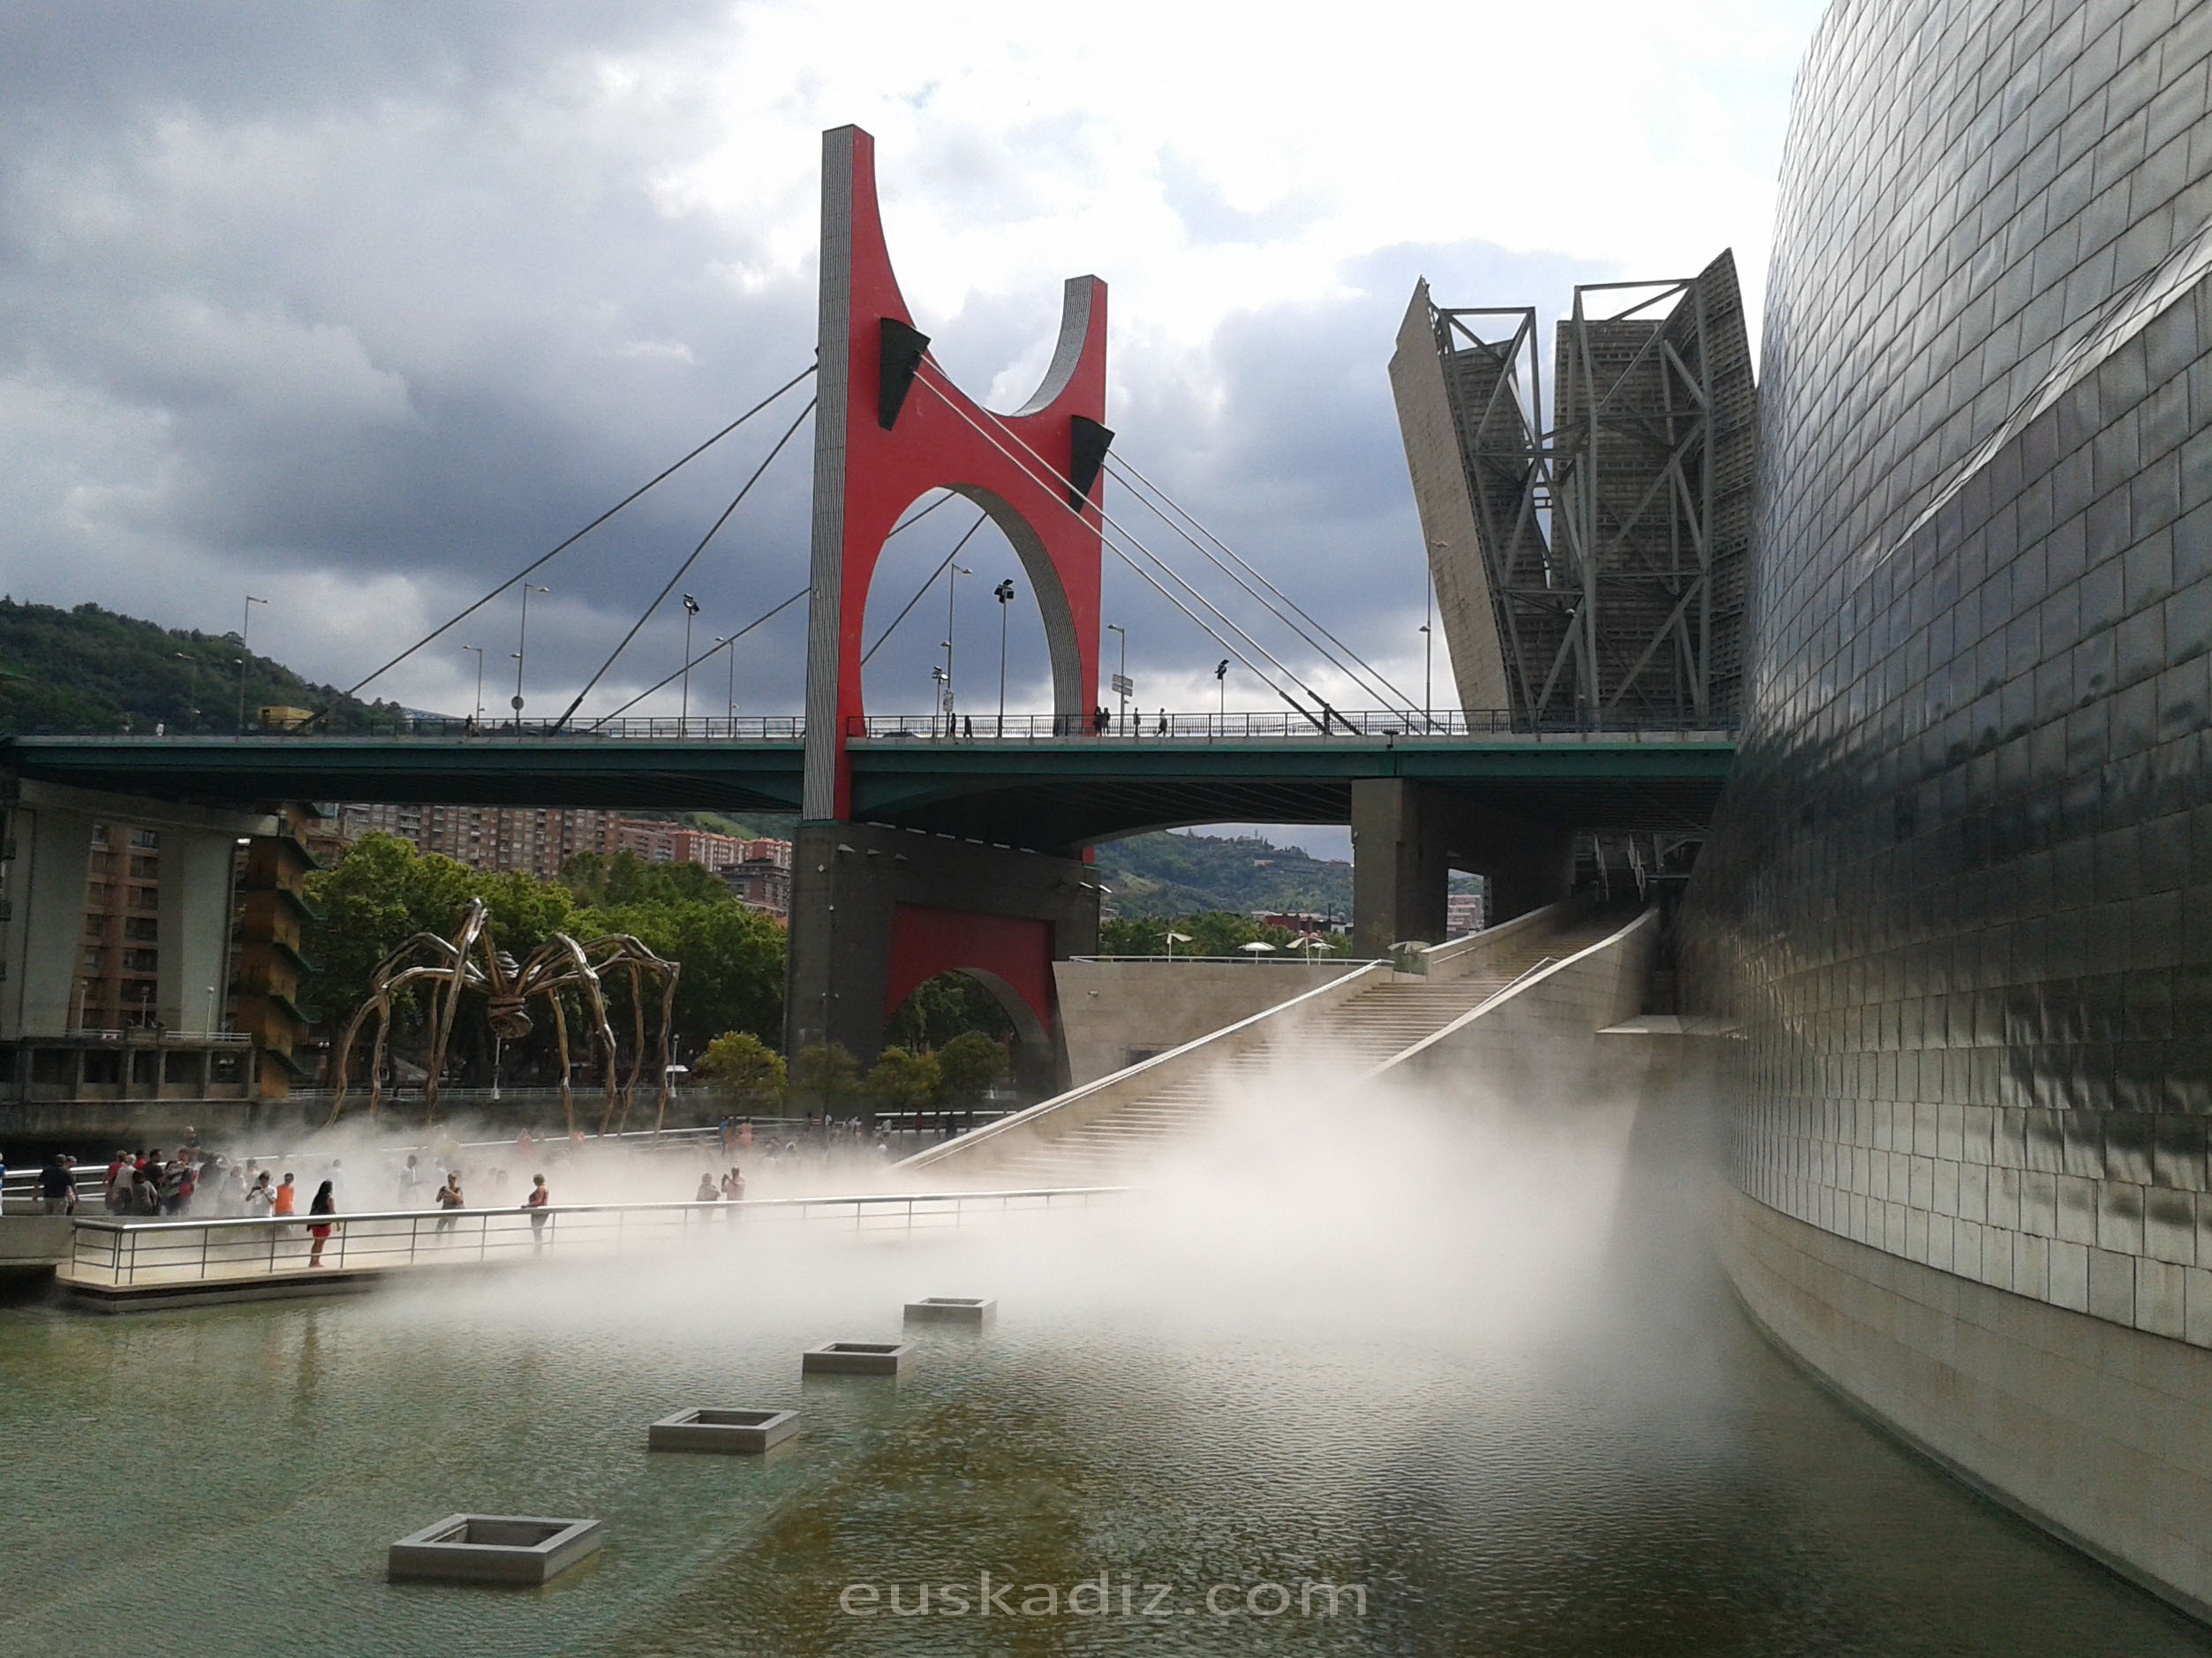 Escultura de niebla. Bilbao